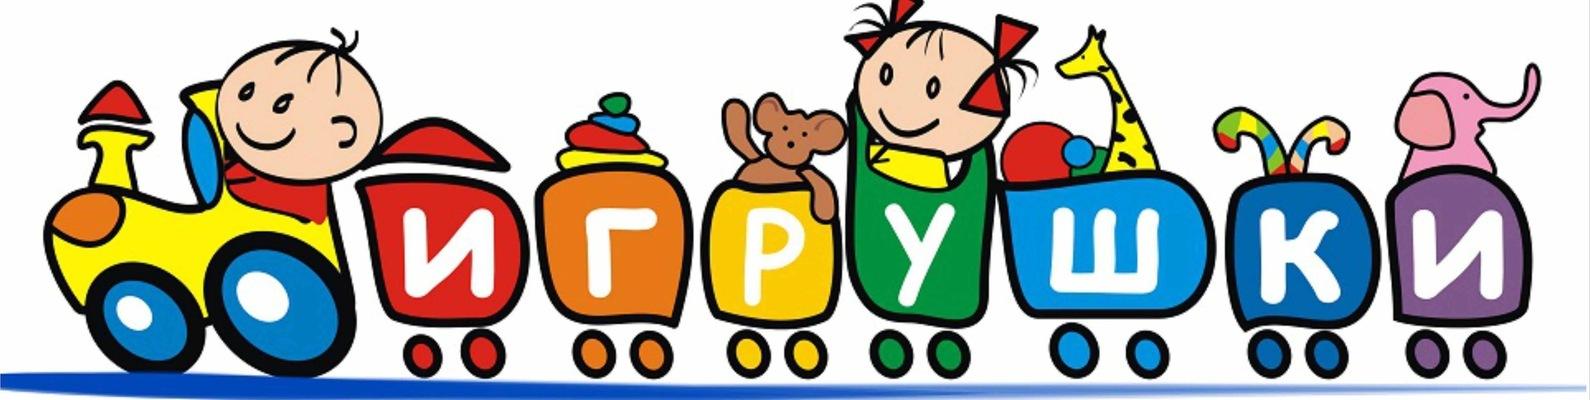 Картинки с надписями про игрушки, вас